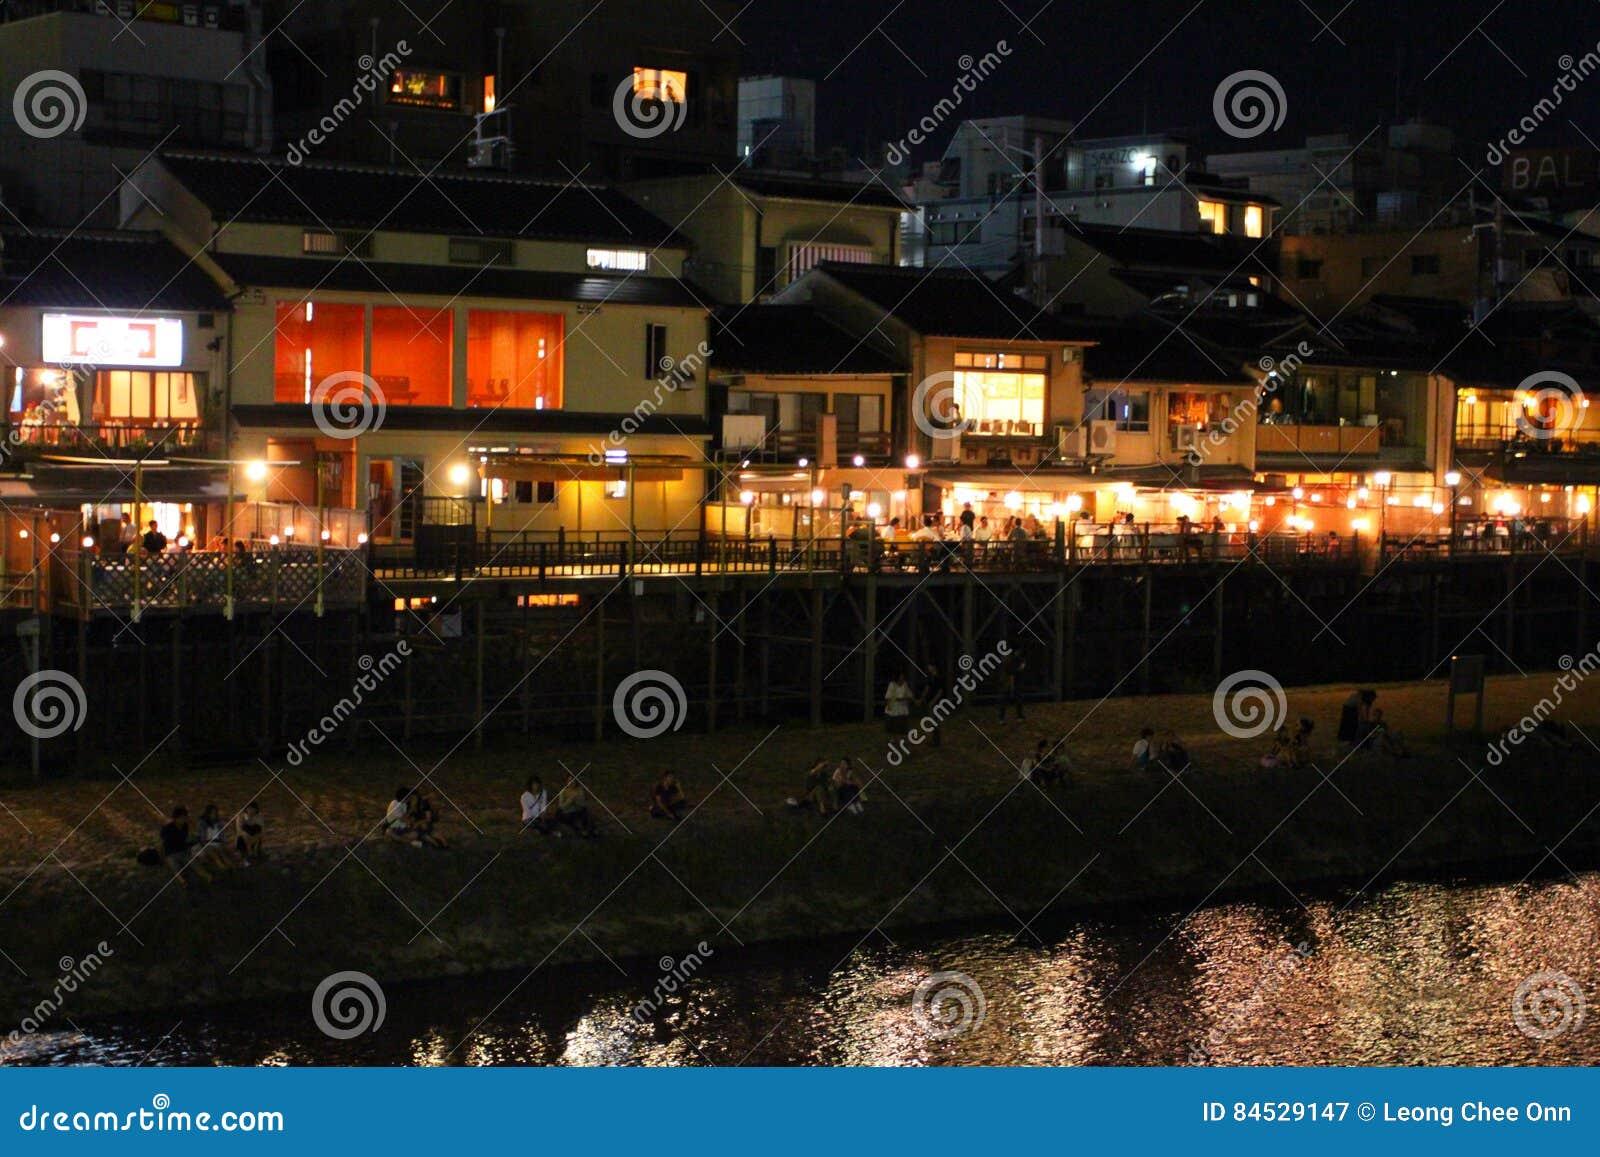 Stock image of Gion, Kyoto, Japan